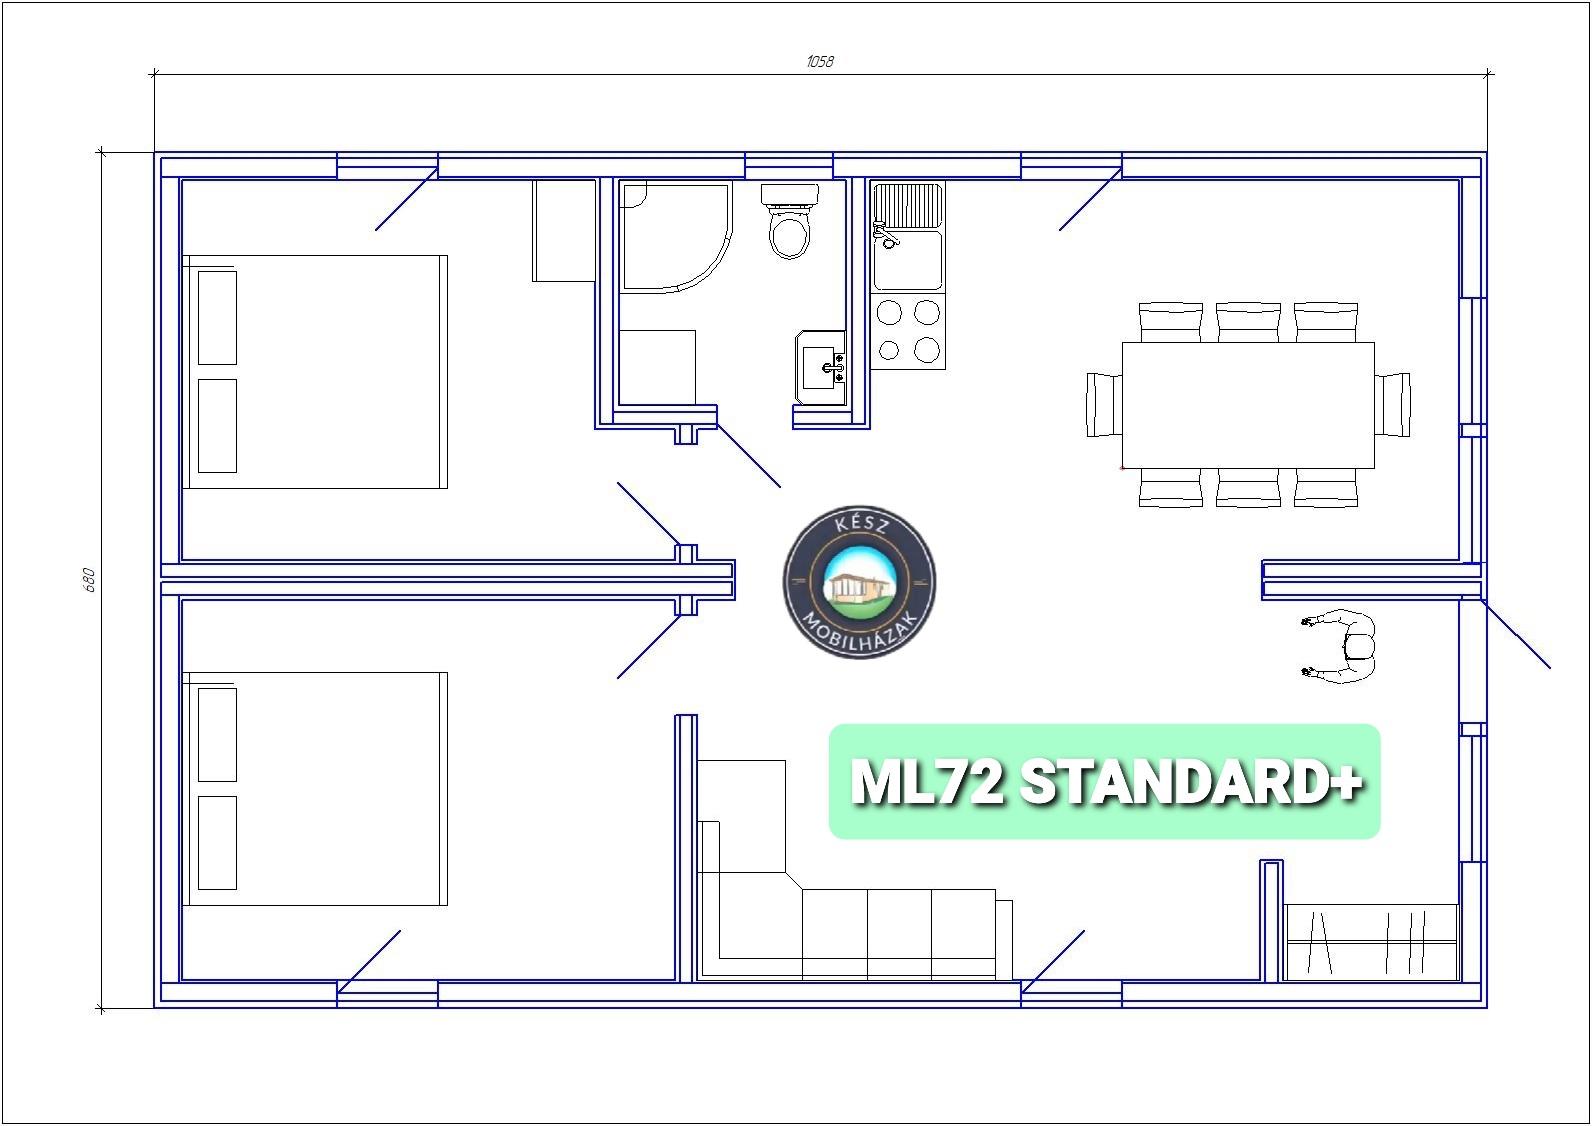 ML72 STANDARD+